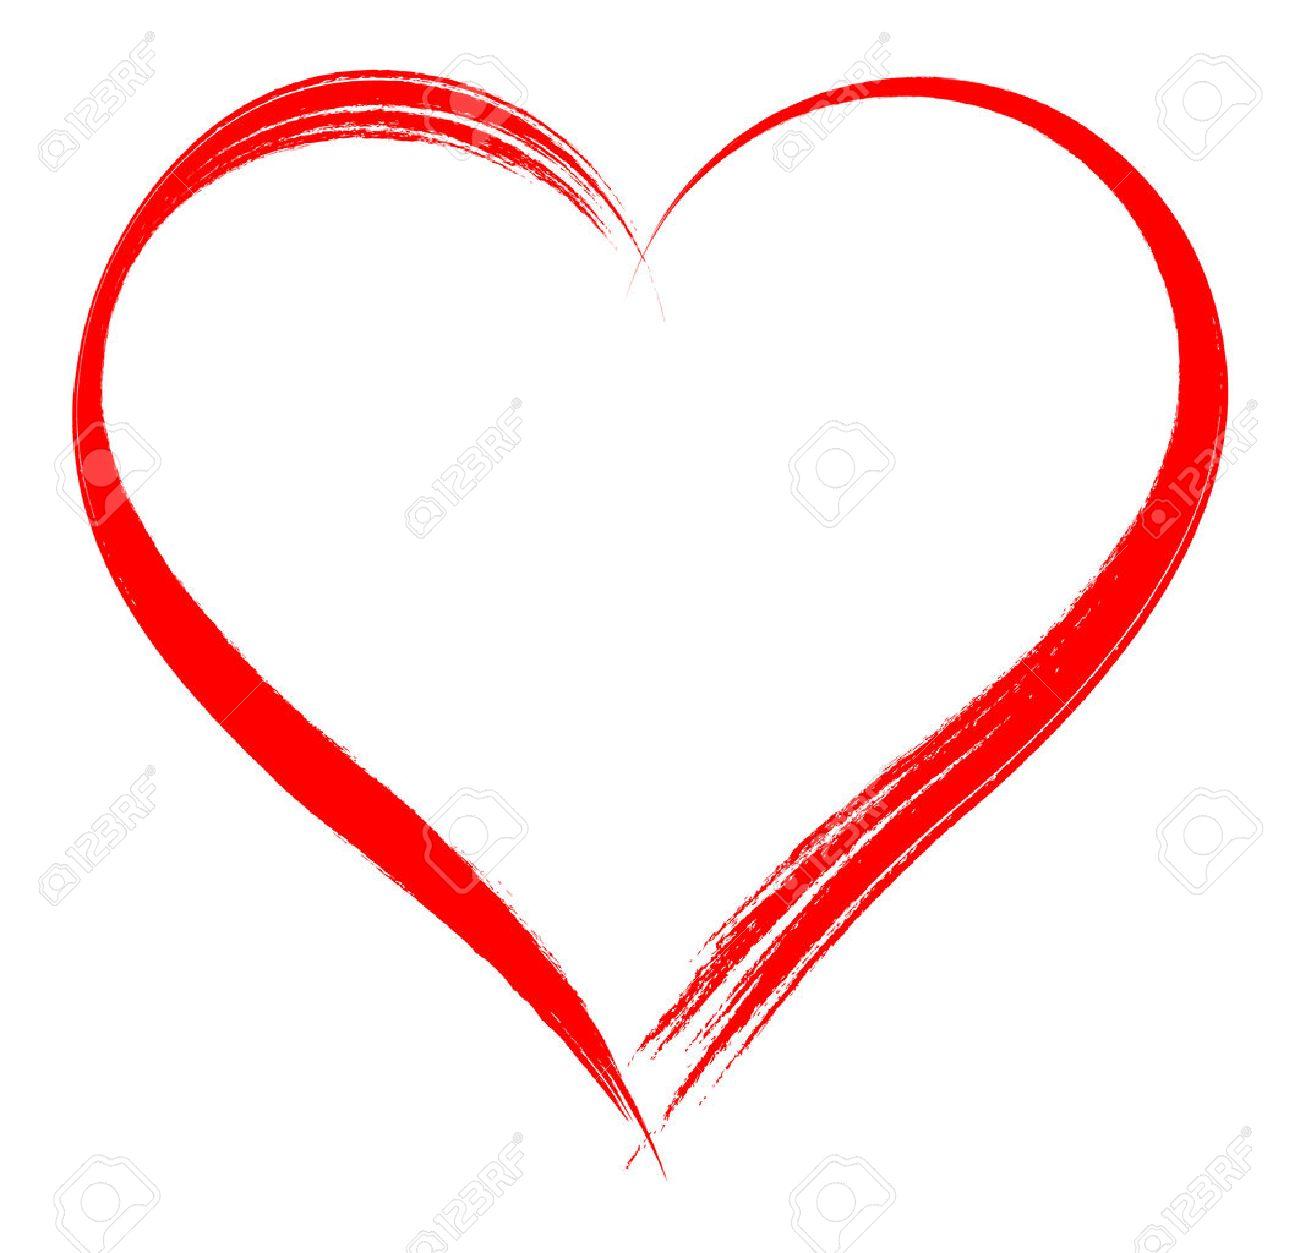 Heart shape frame with brush painting isolated on white background - 69181035